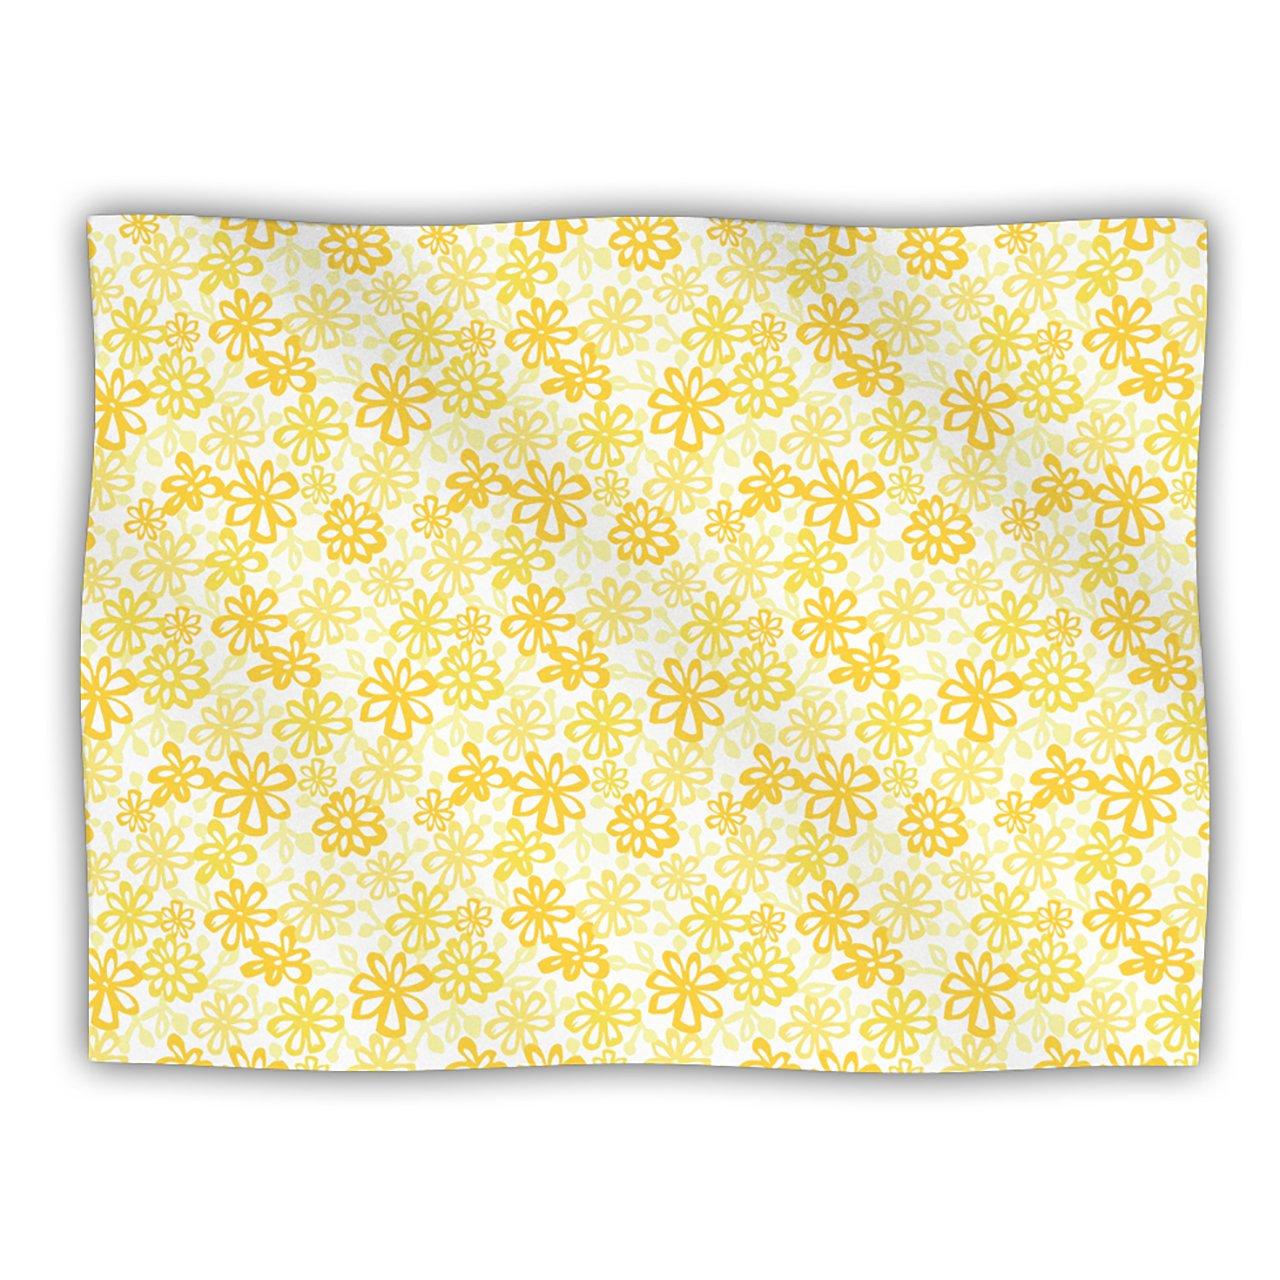 Kess InHouse Julie Hamilton 'Paper Daisy' Yellow Dog Blanket, 40 by 30-Inch